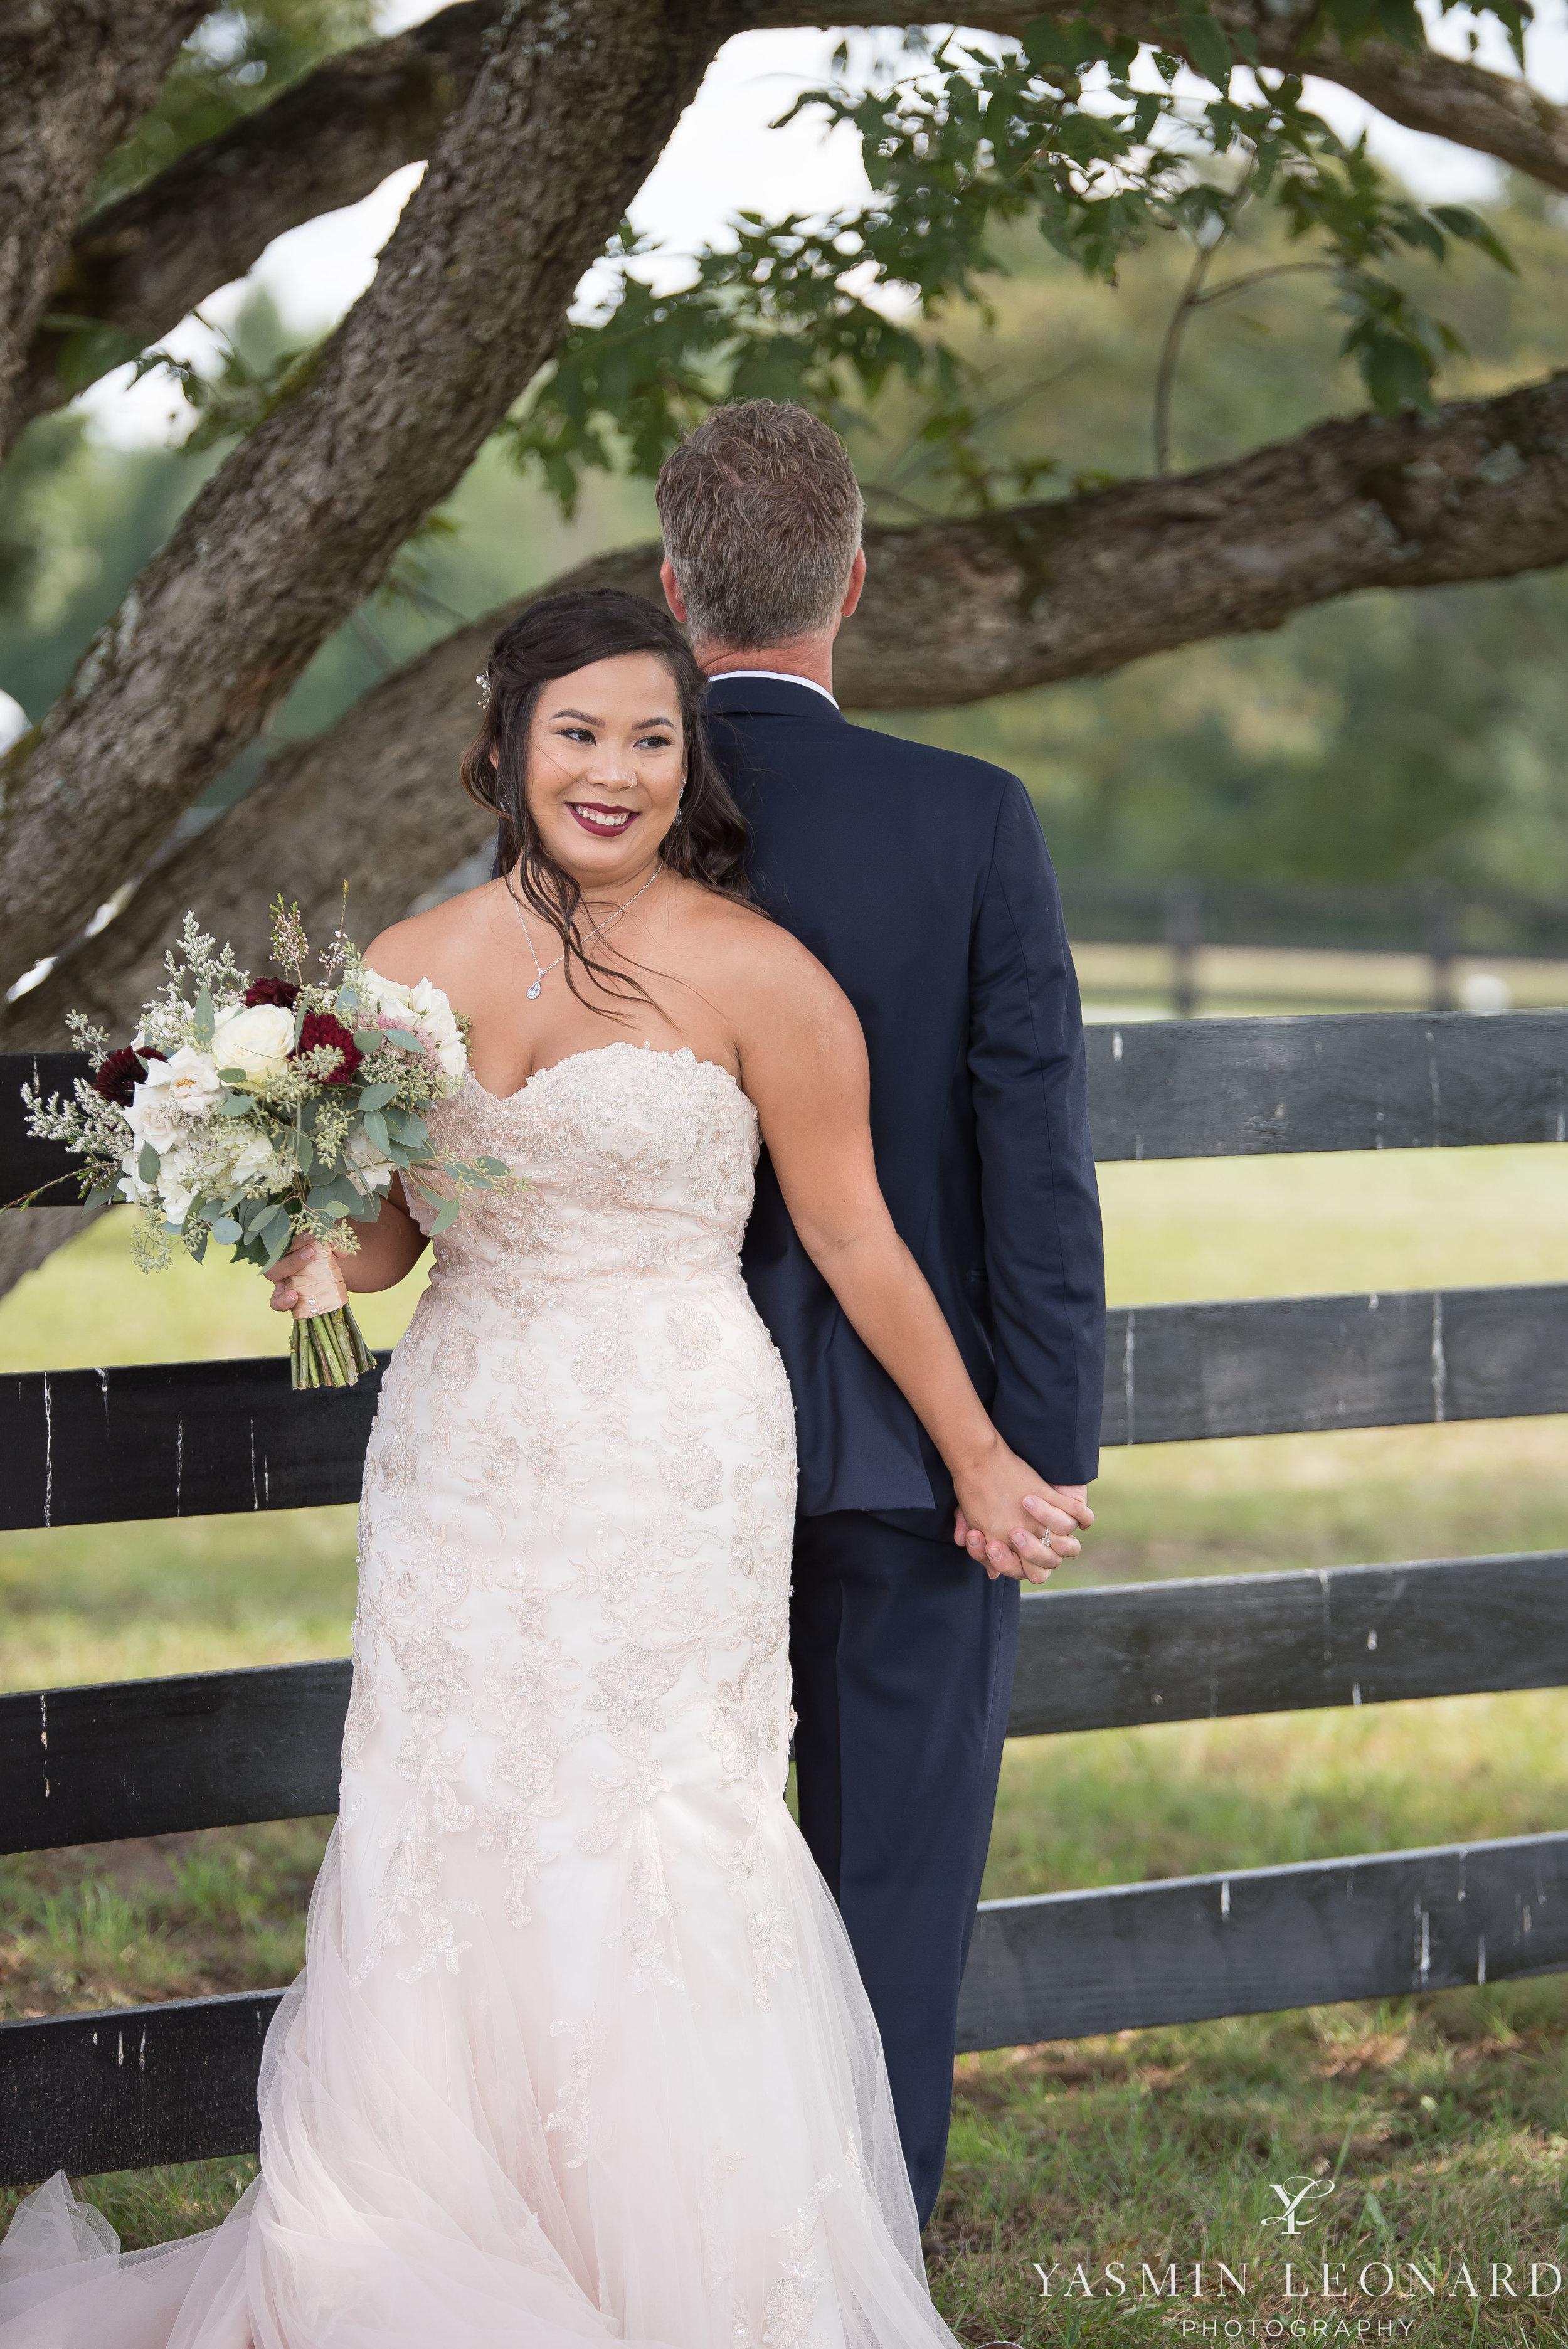 Mason Ridge   Liberty, NC   Aylissa and John   Yasmin Leonard Photography-34.jpg